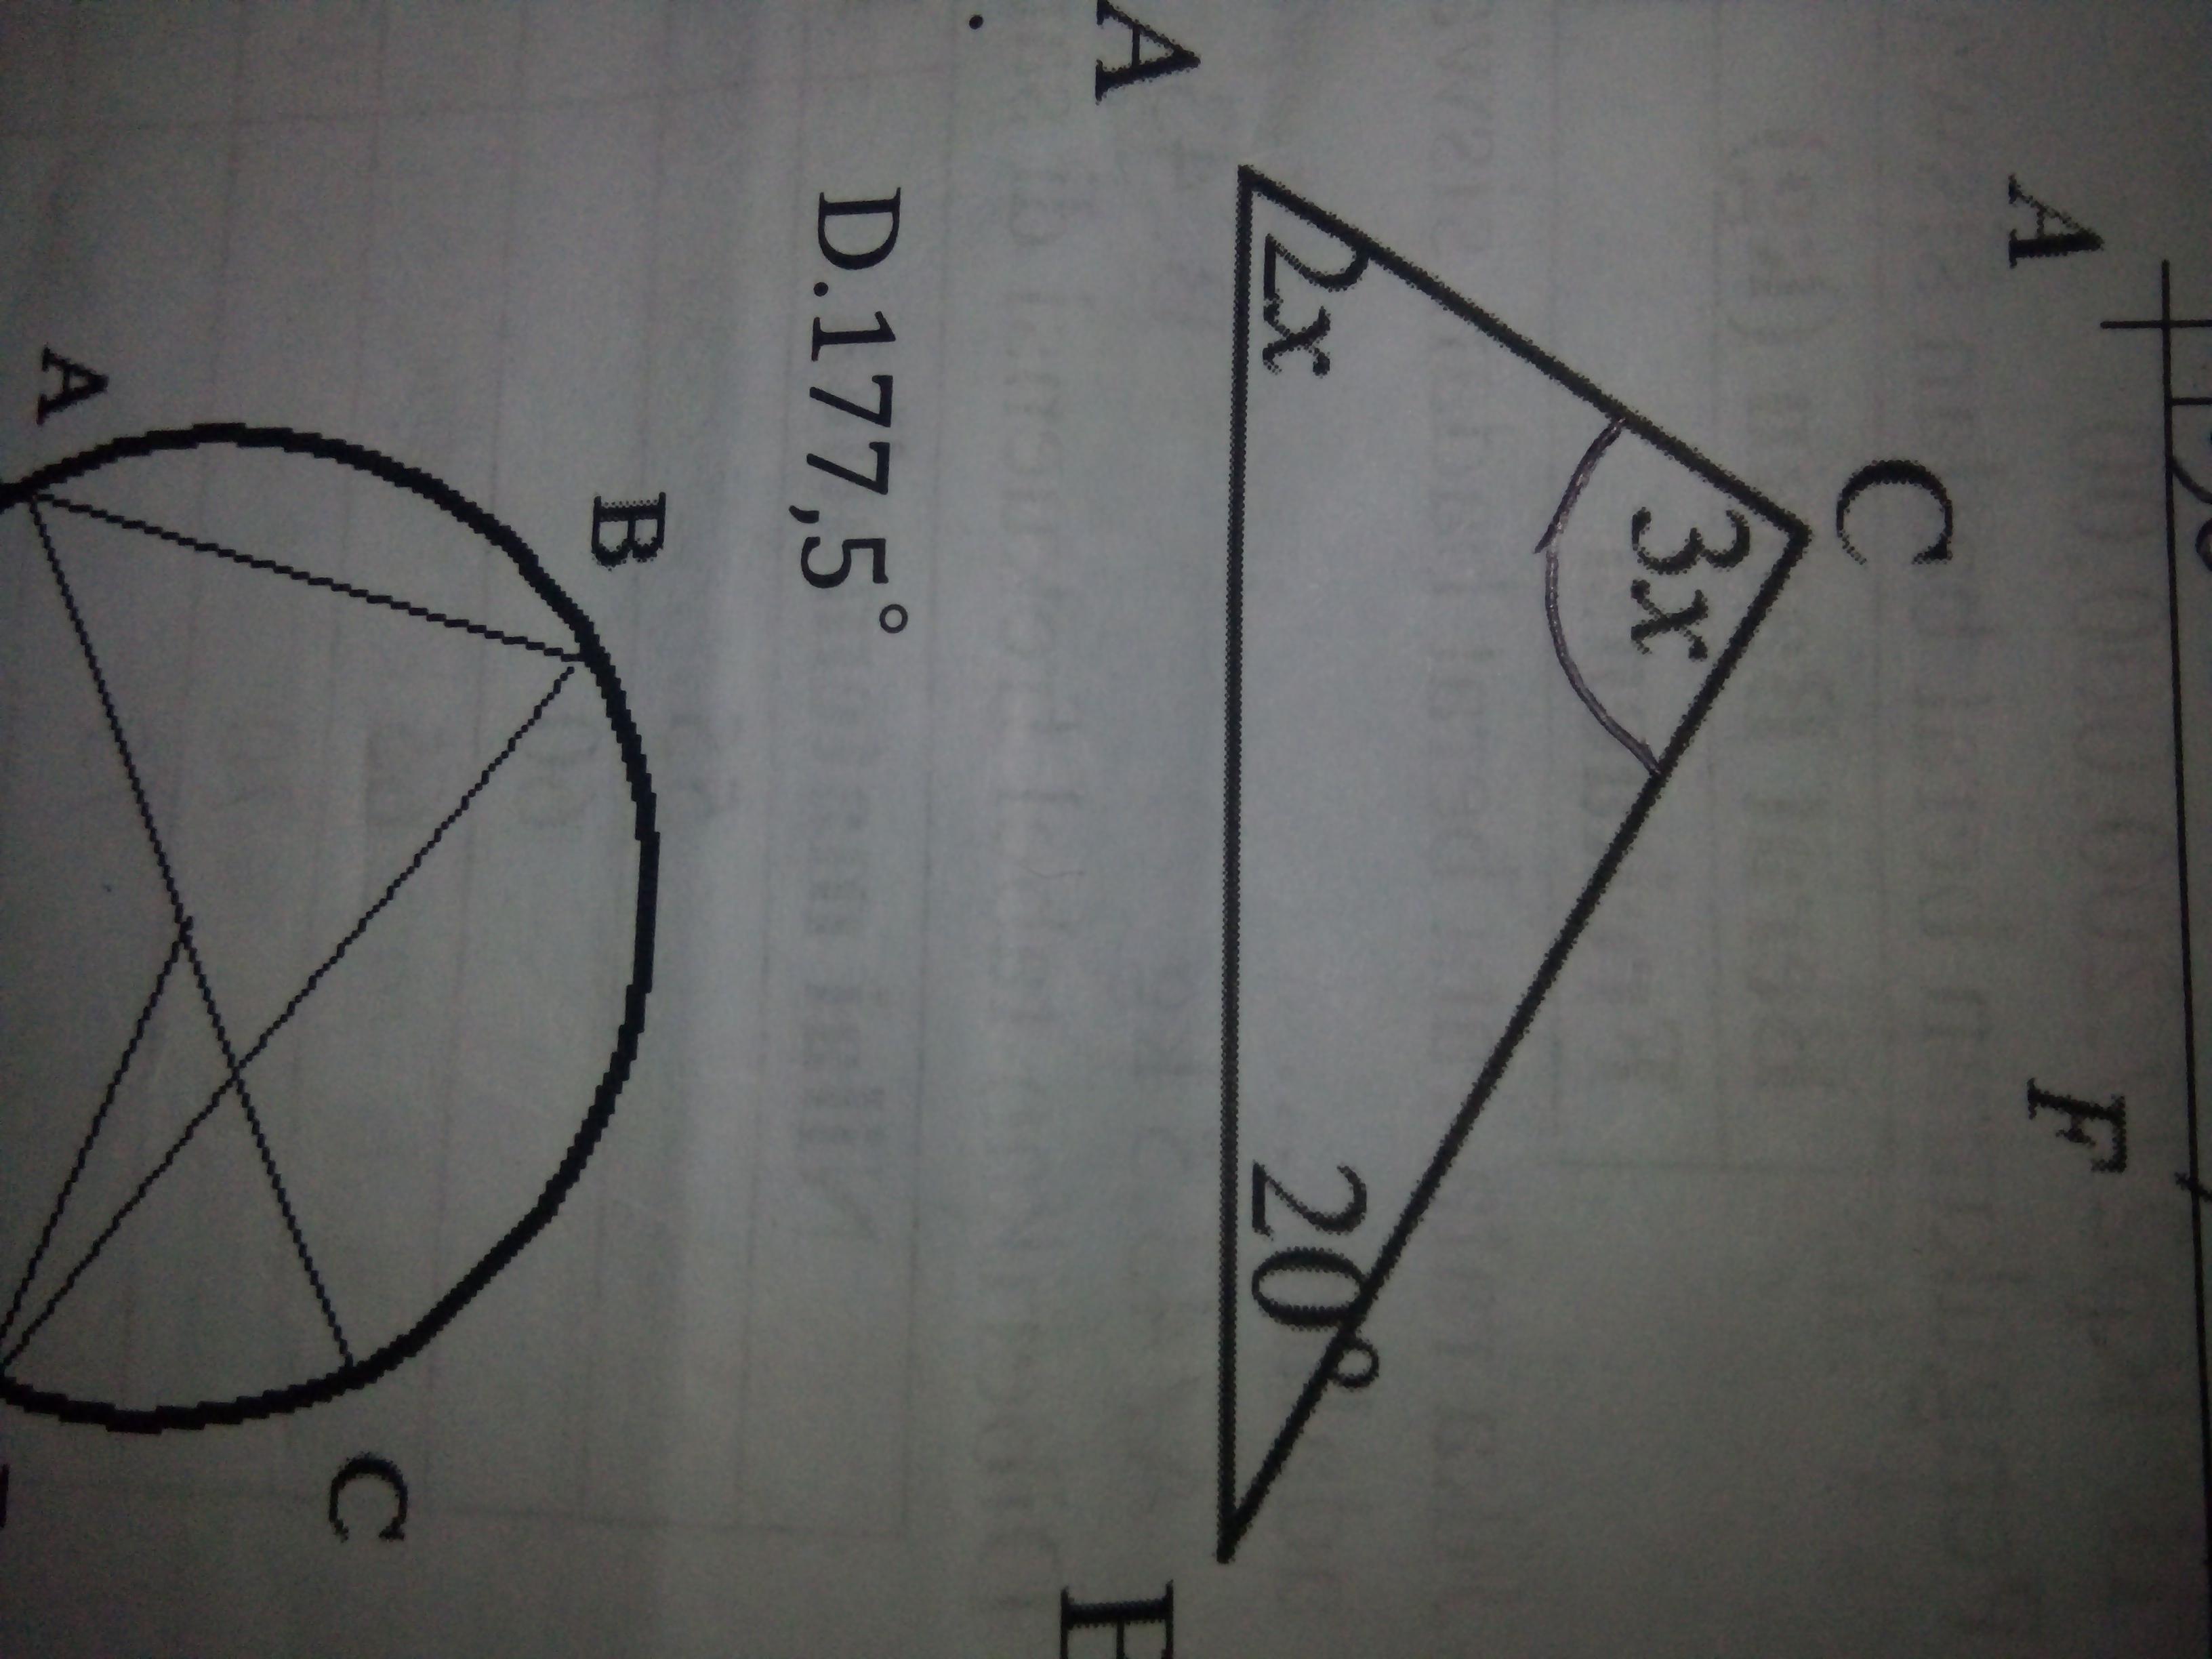 Perhatikan gambar dibawah ini. Besar sudut C adalah ...